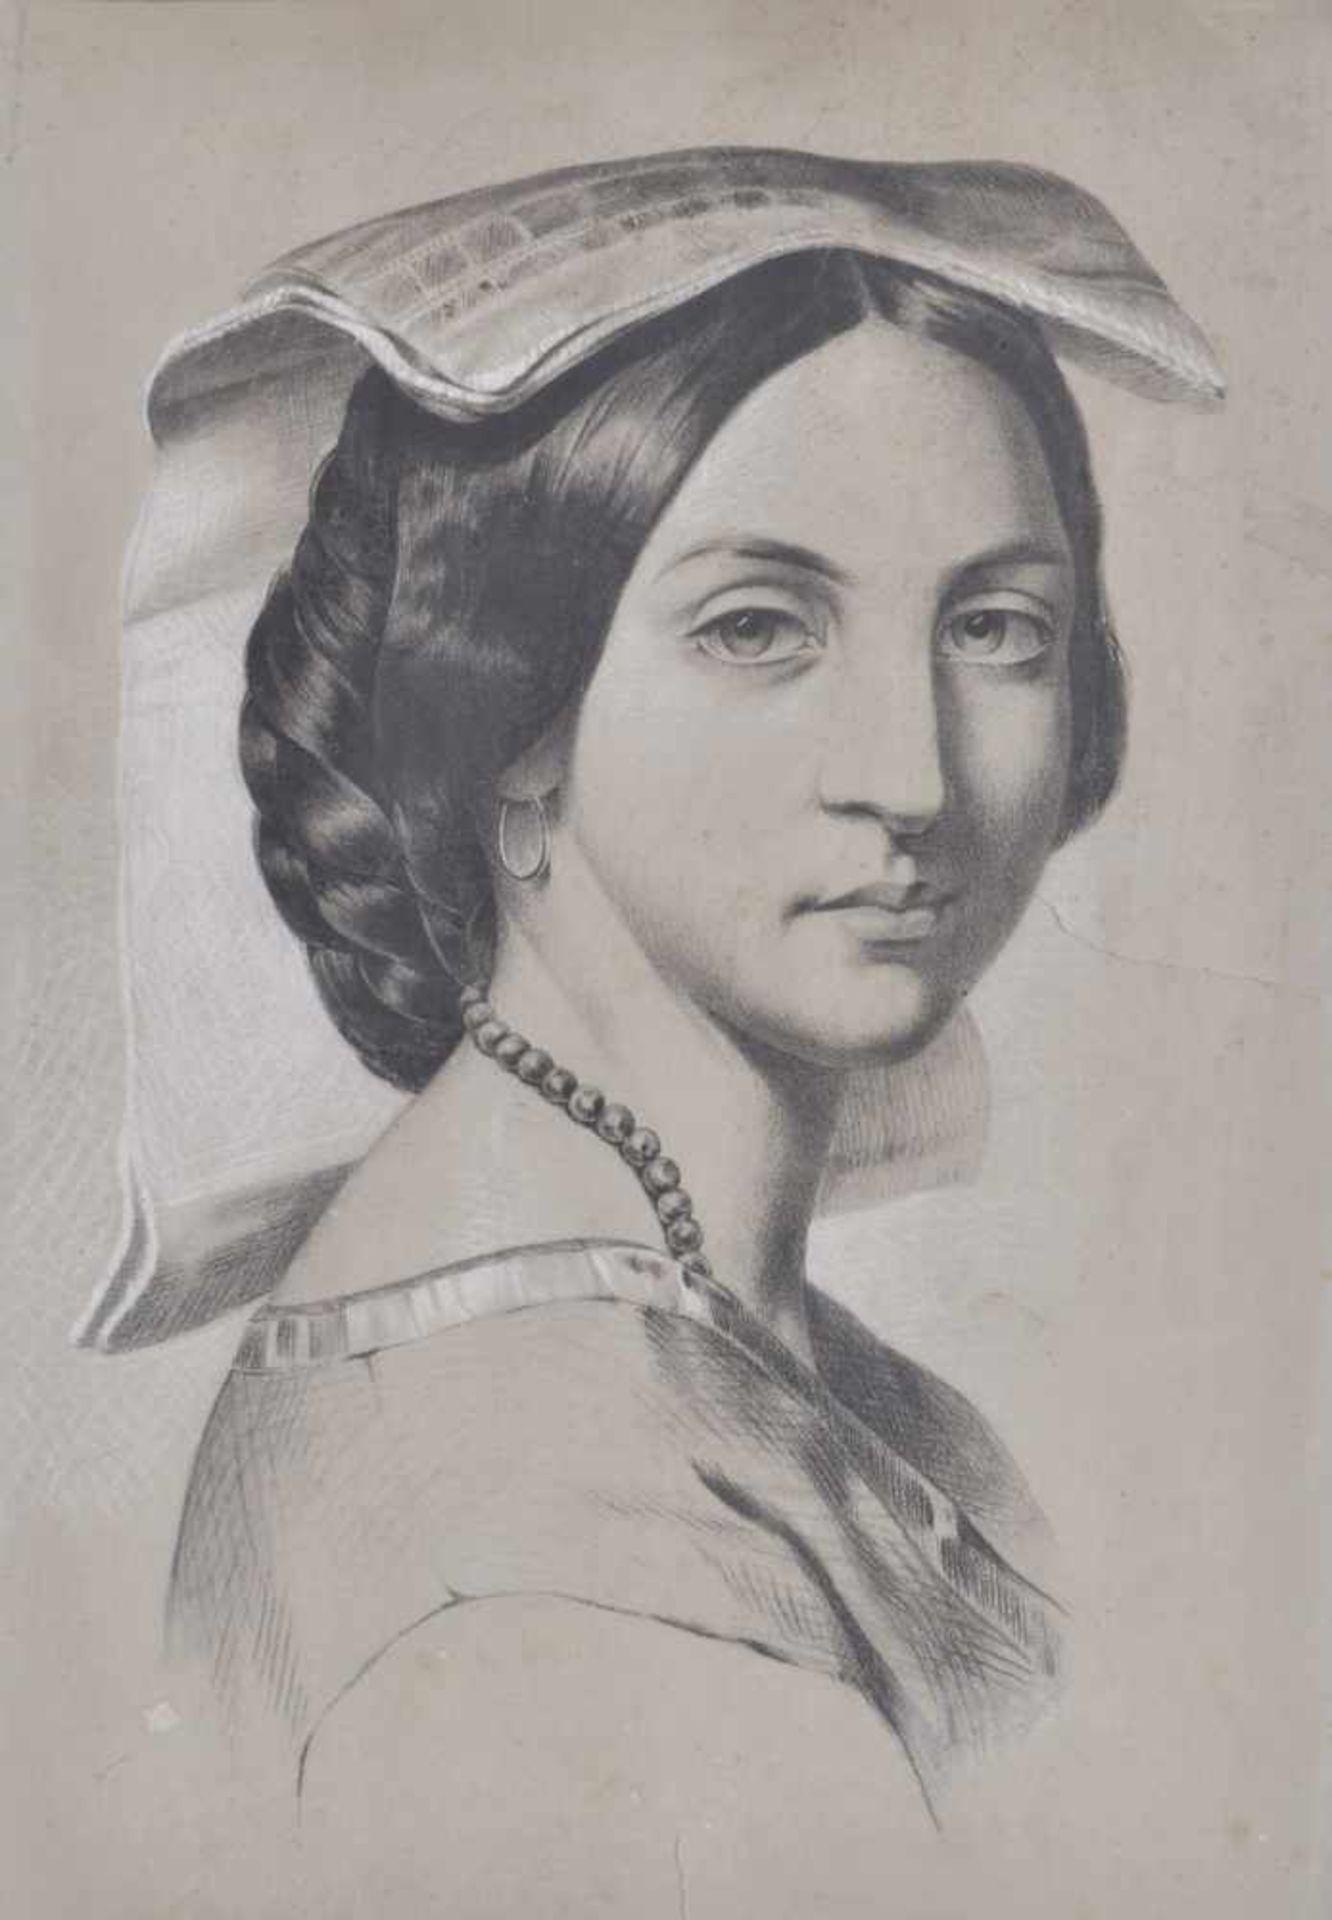 Eugenio Prati (Caldonazzo 1842 – Caldonazzo 1907)